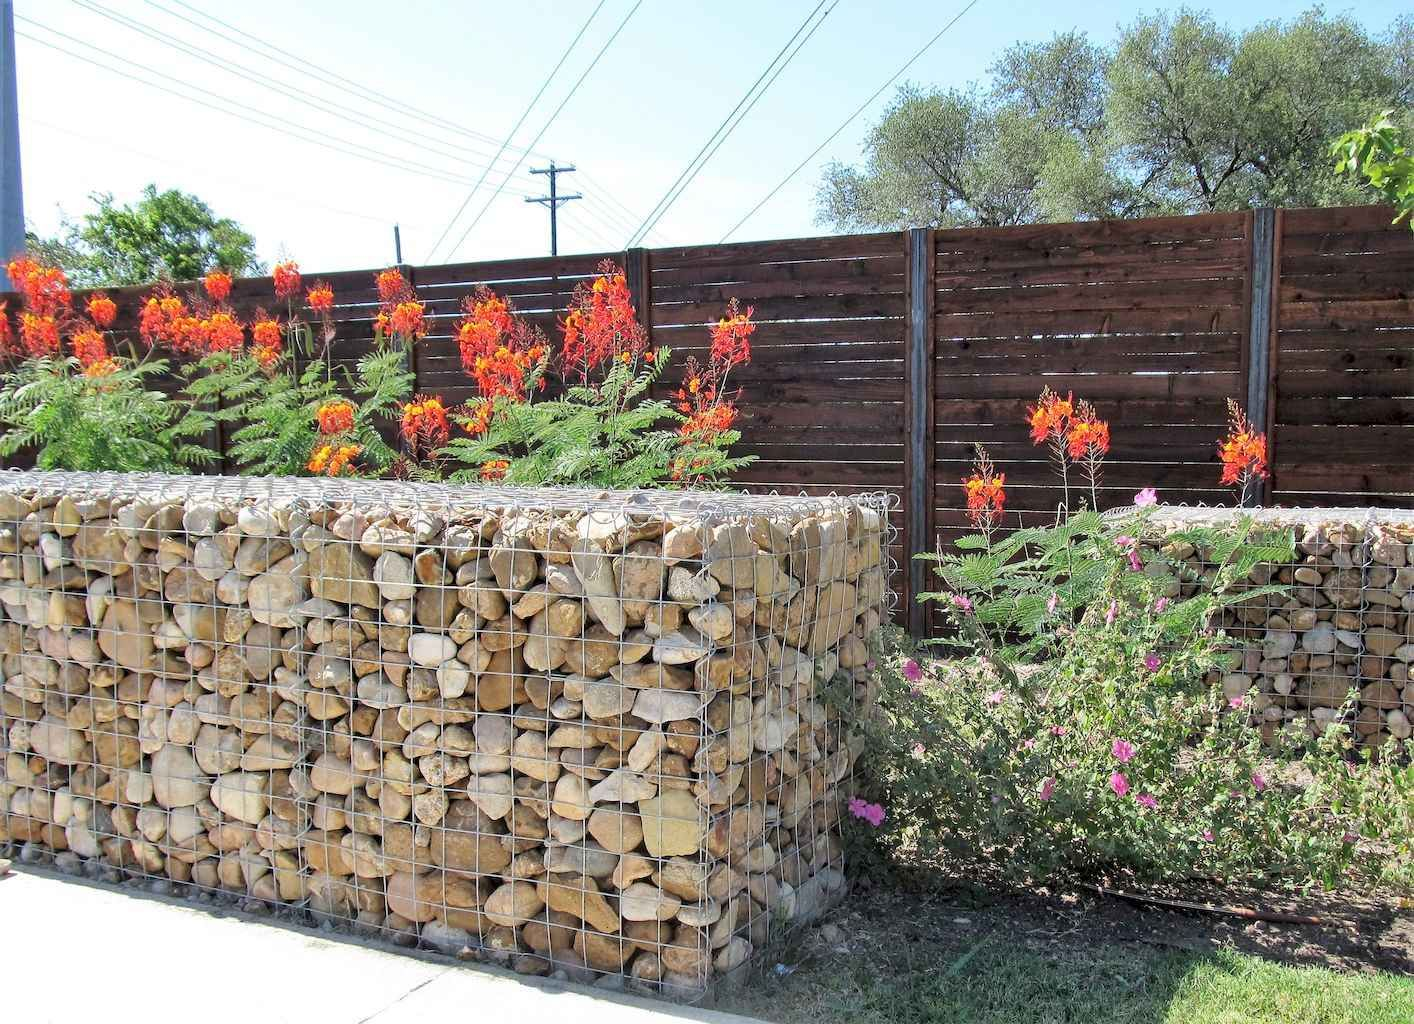 55 Gorgeous Gabion Fence Design For Garden Ideas Decorationroom Gabion Fence Fence Design Garden Landscape Design